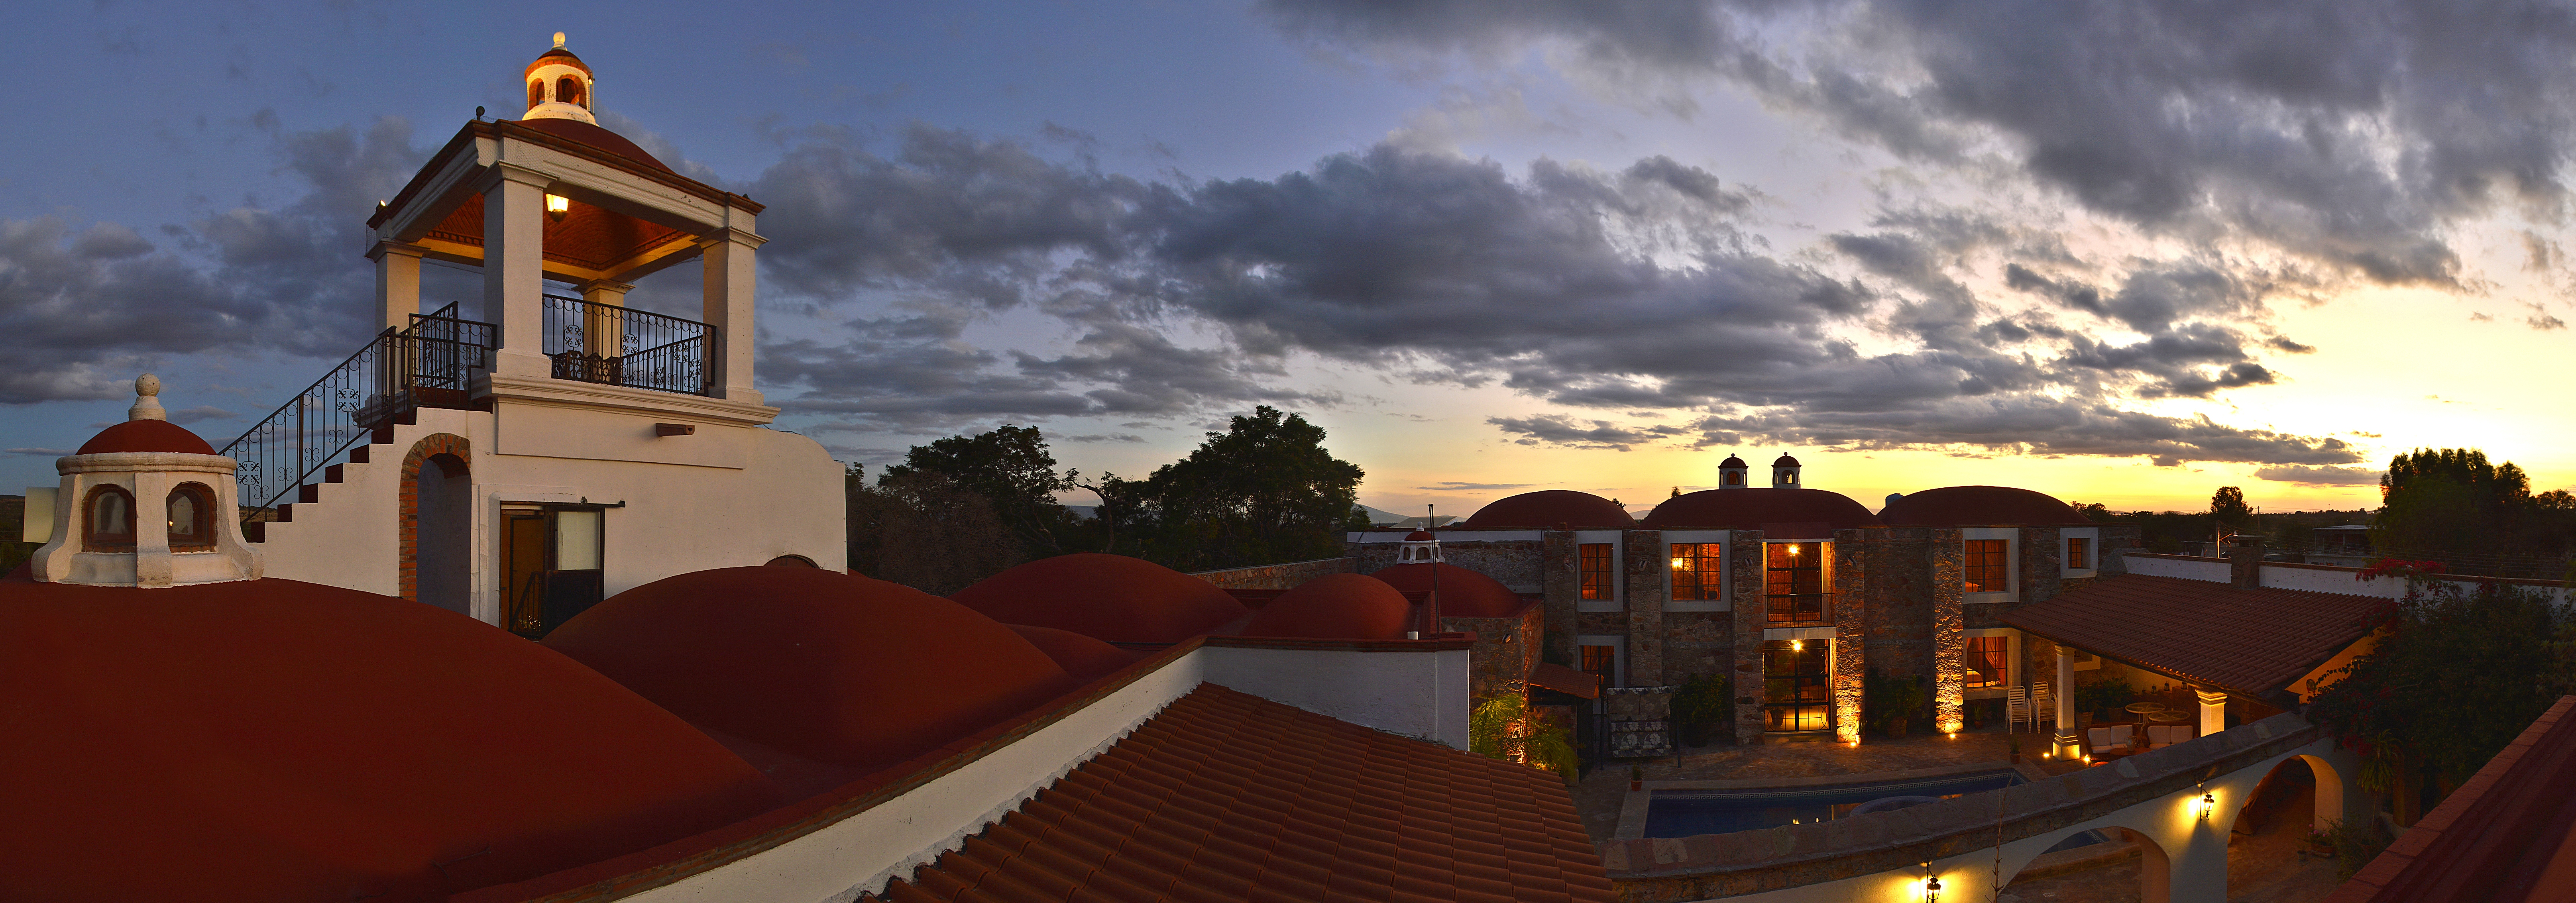 Santa Cruz de Juventino Rosas